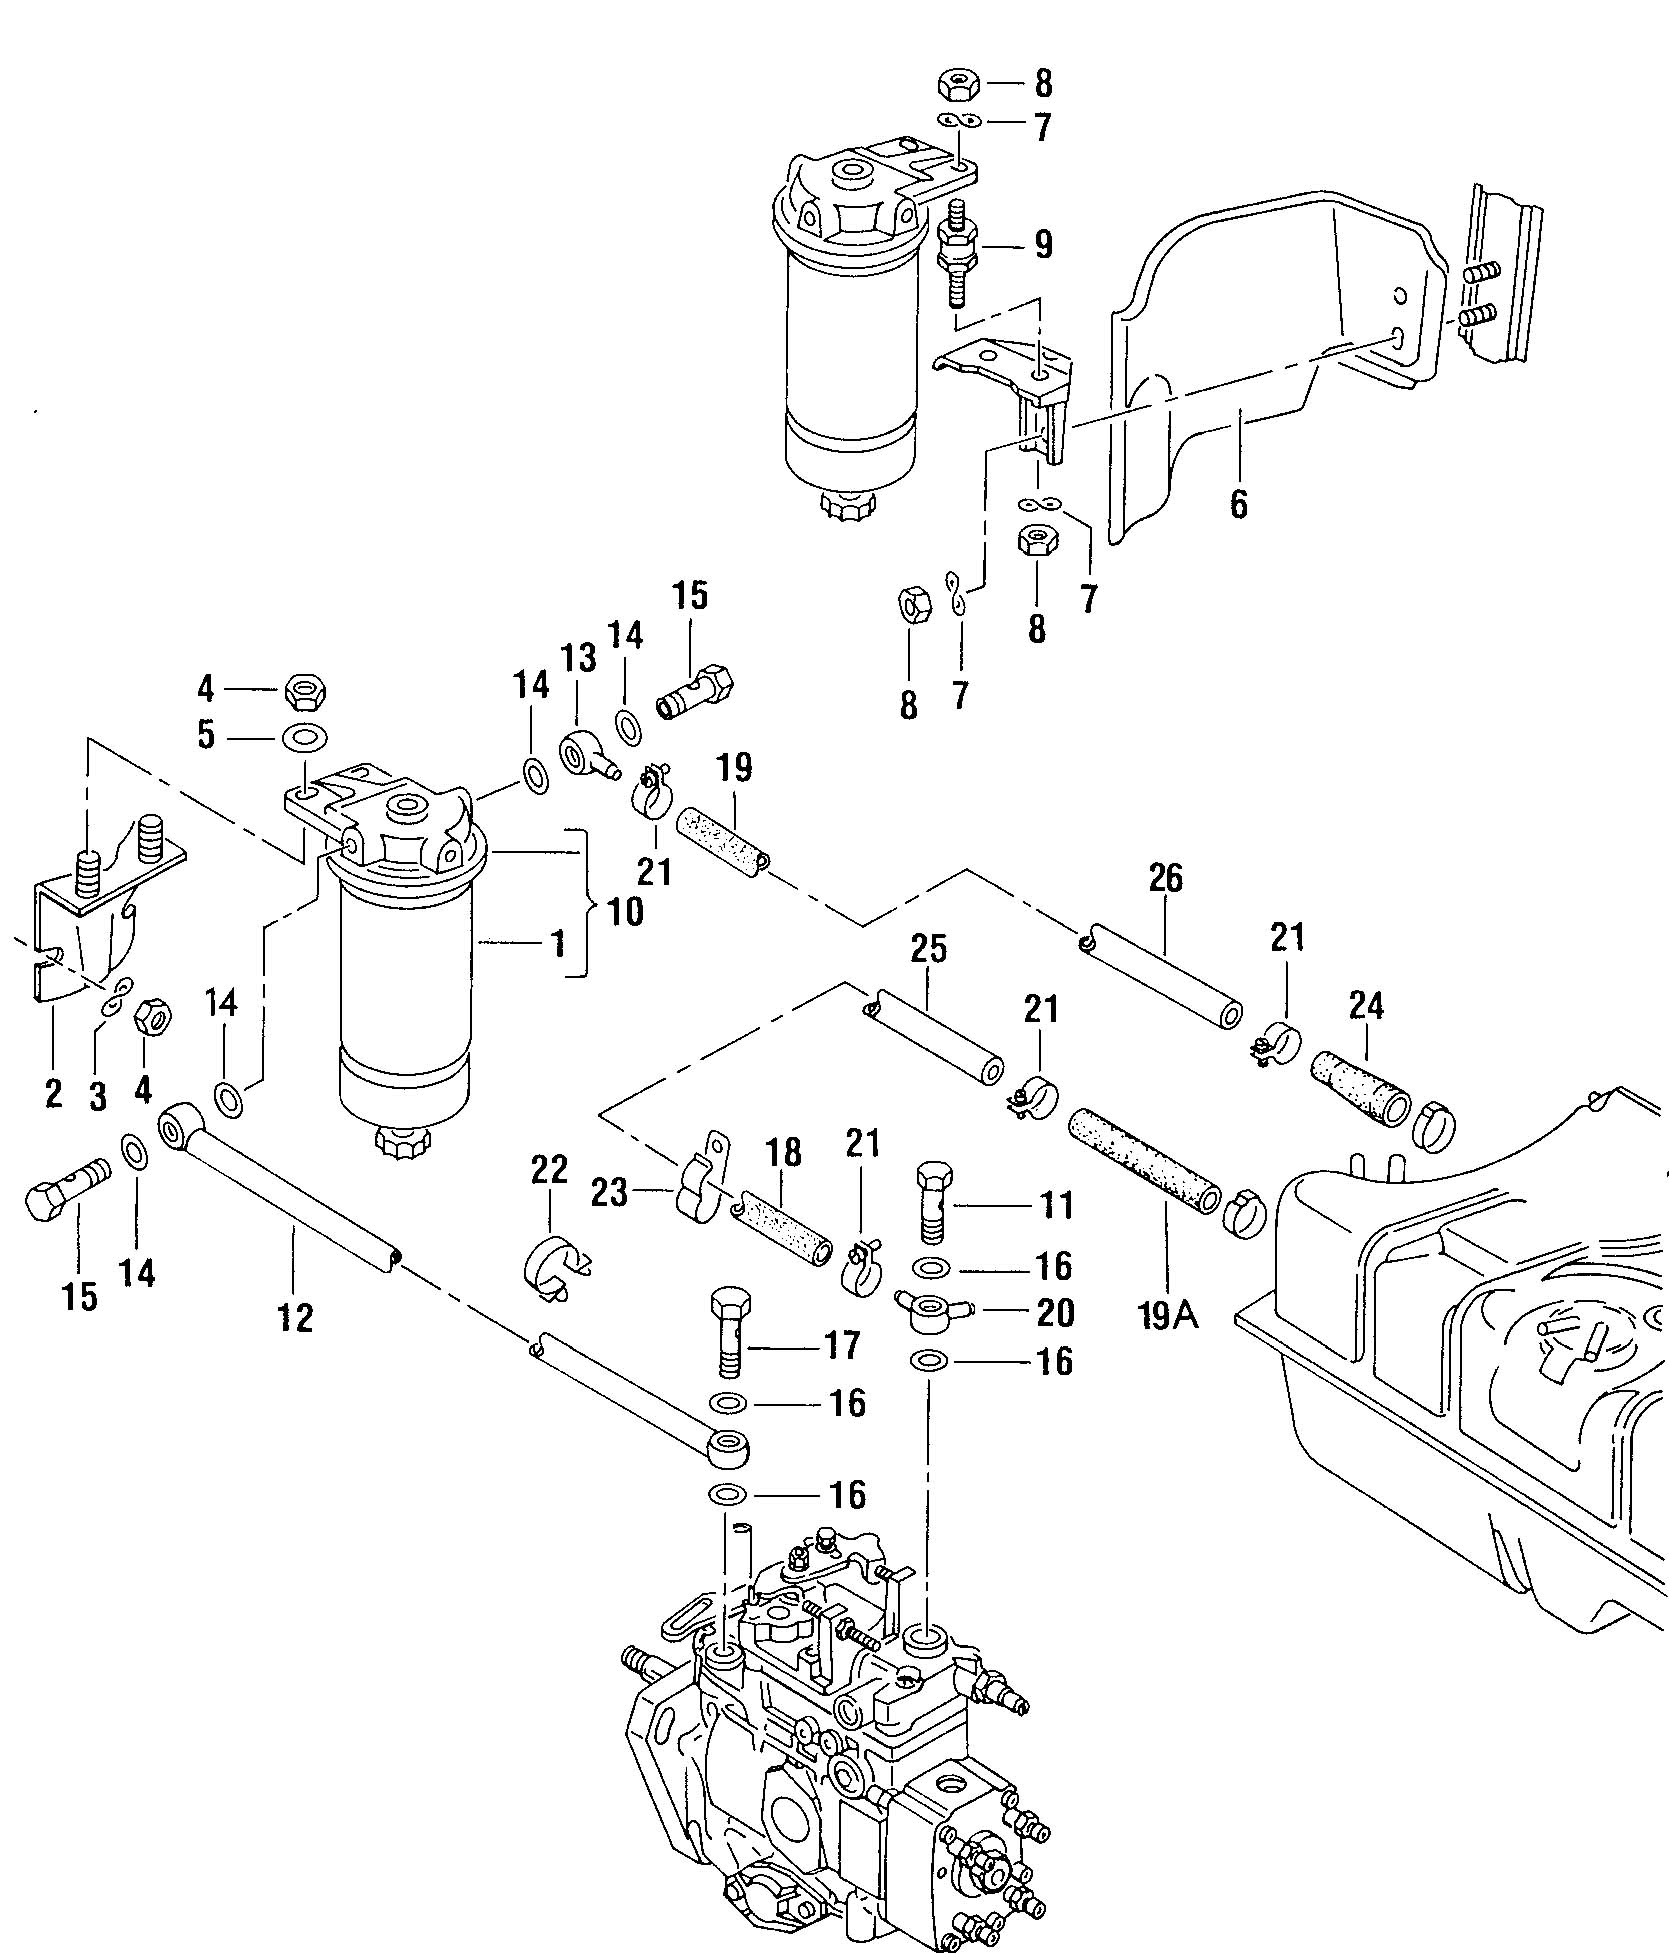 1998 volkswagen beetle fuse box diagram